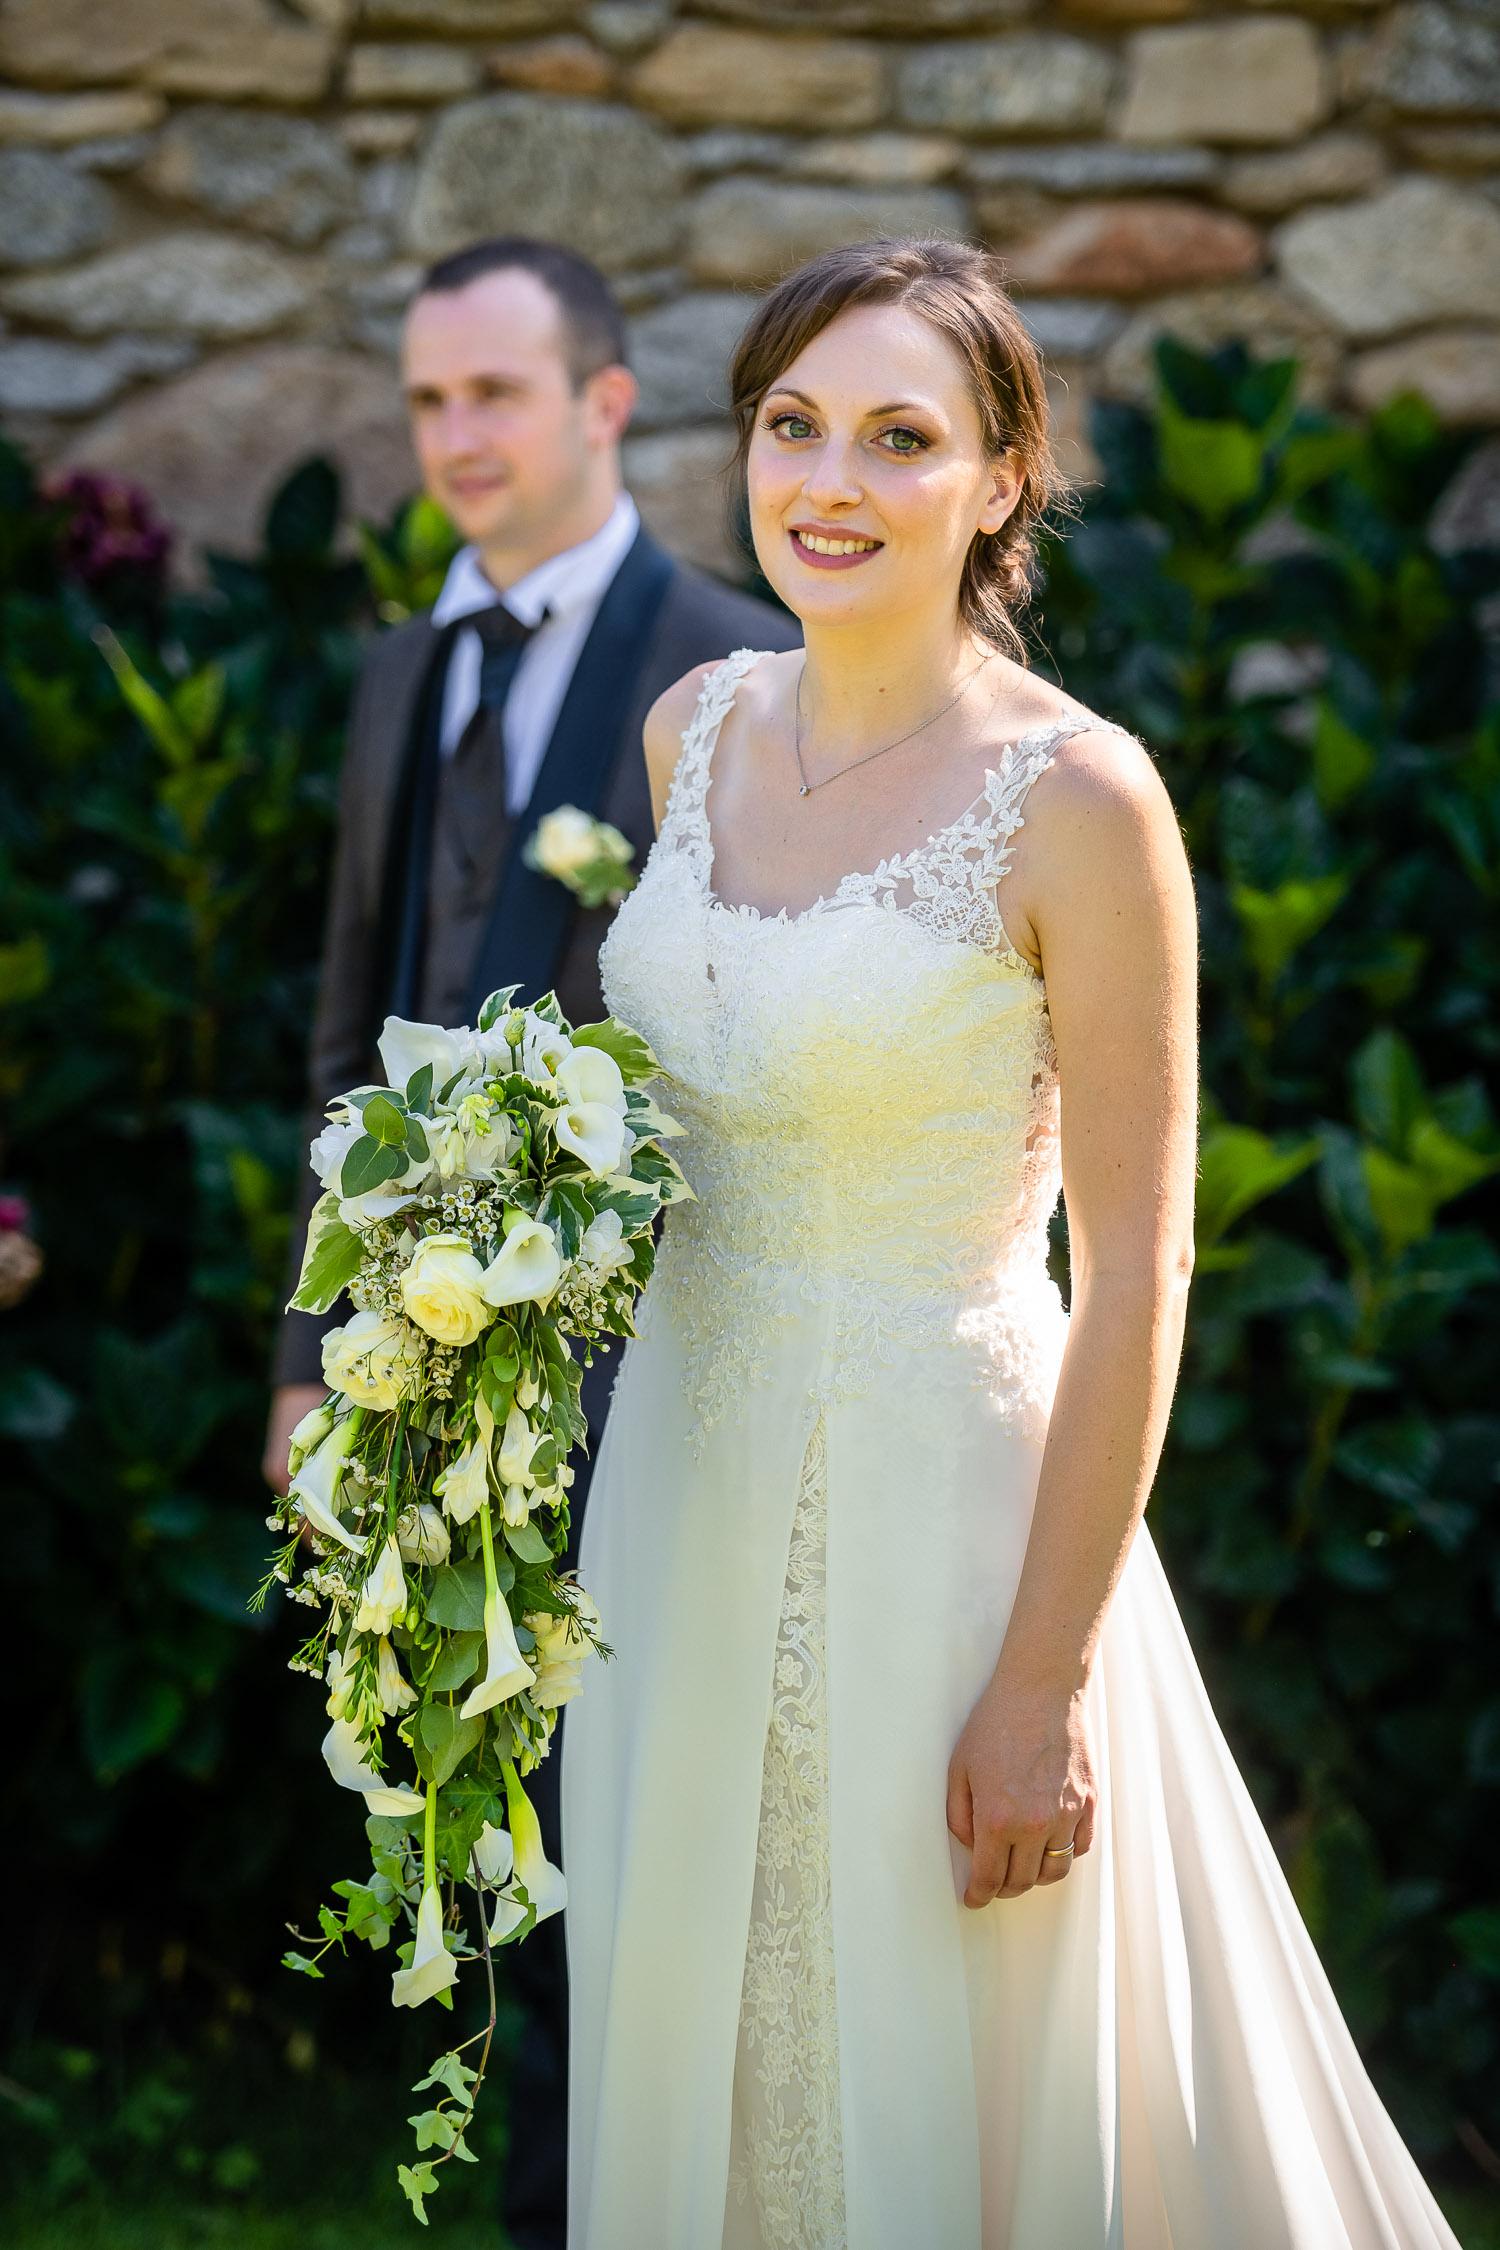 PAOLO-MANTOVAN-FOTOGRAFIA-ROMANTIC-WEDDING-IN-PIEMONTE-ADRIANA-E-LUCA-MAISON-VERTE-120